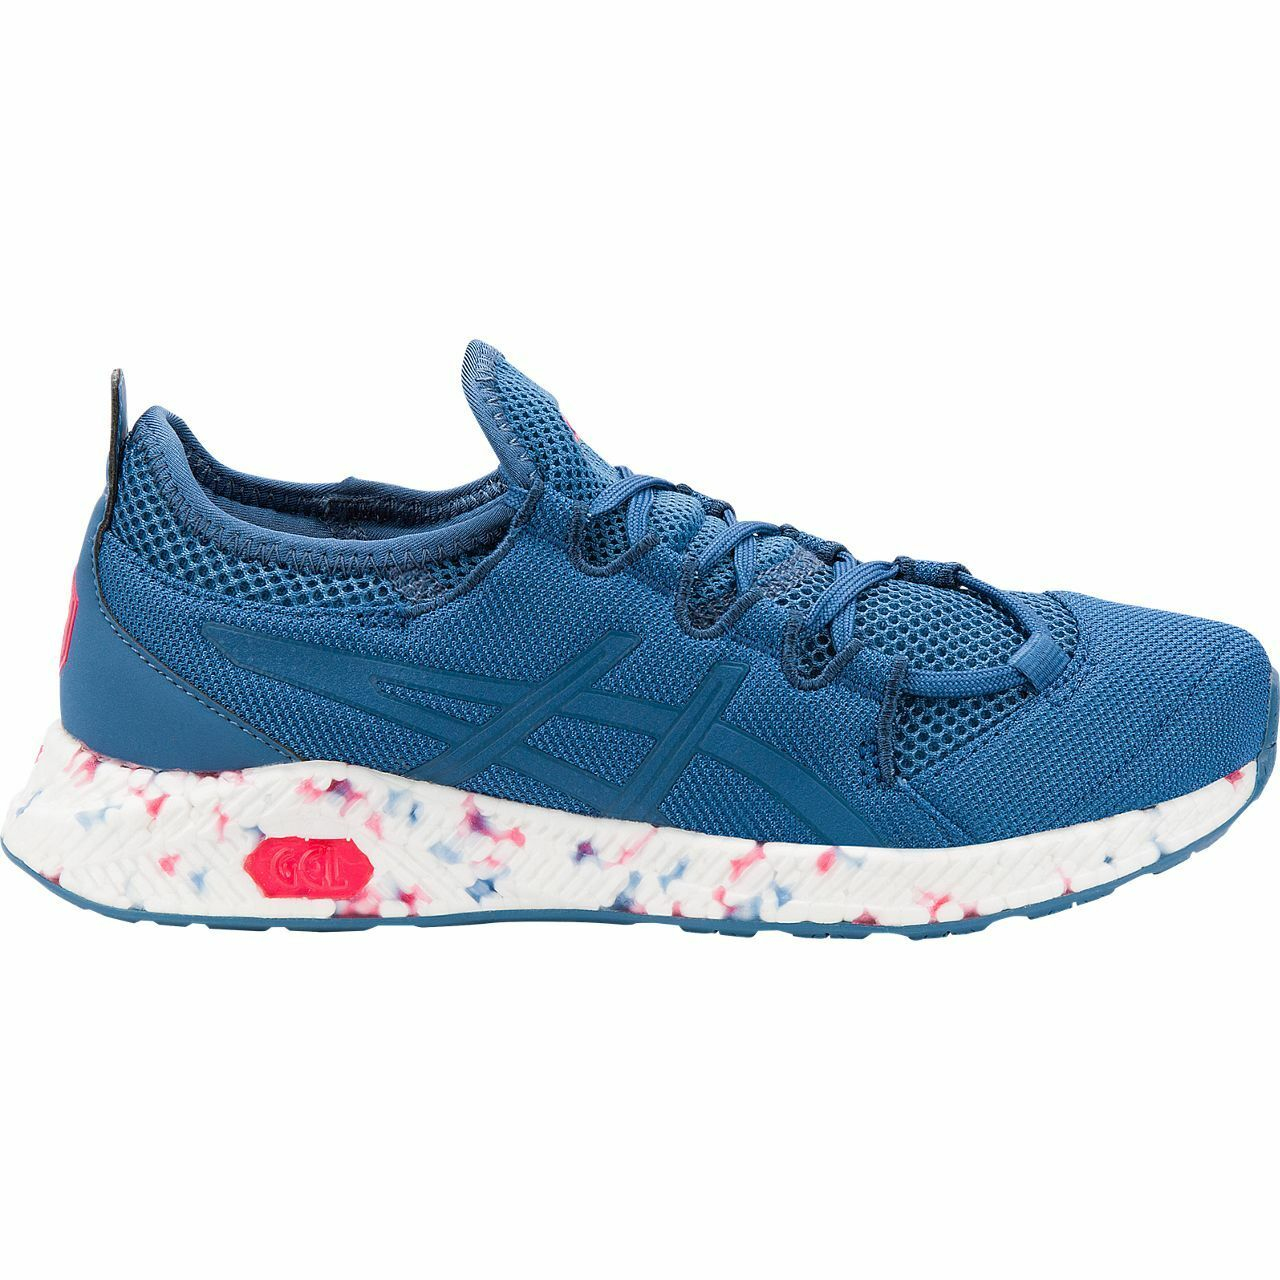 Asics 1022A013 400 hypergel SAI Azure Azure Azure Azul para Mujer Zapatos Para Correr  precios bajos todos los dias